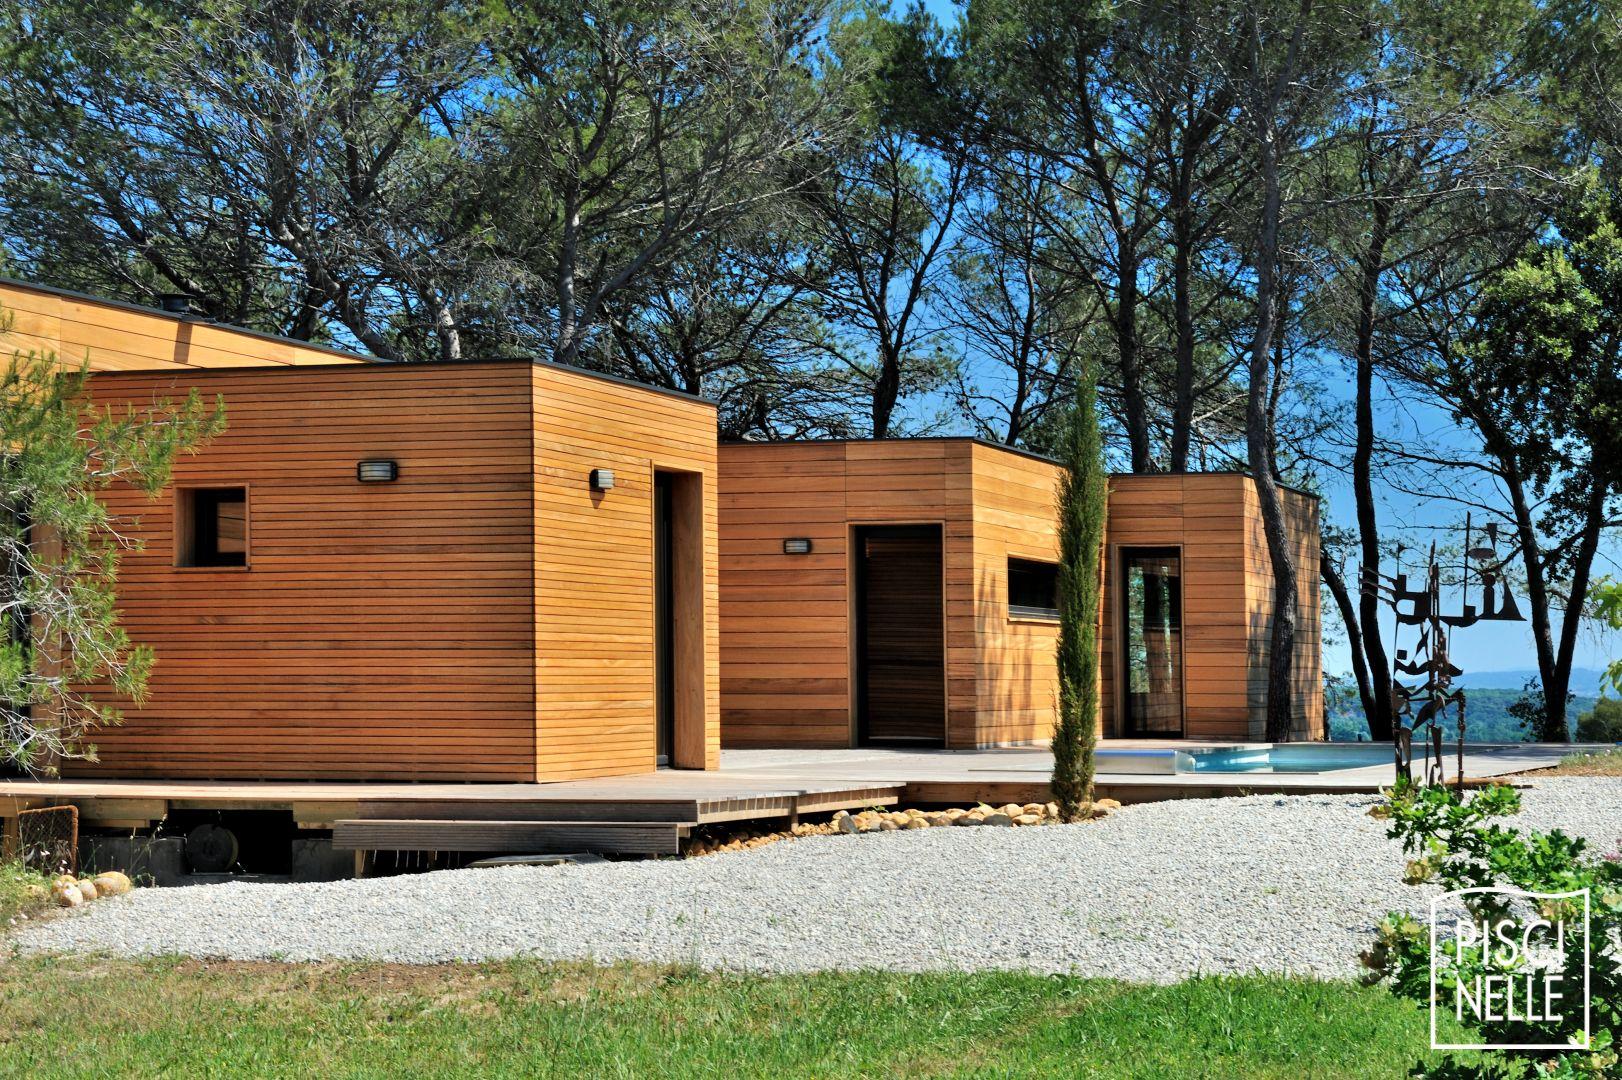 Maison En Bois Gard u2013 Maison Moderne # Maison En Bois Gard